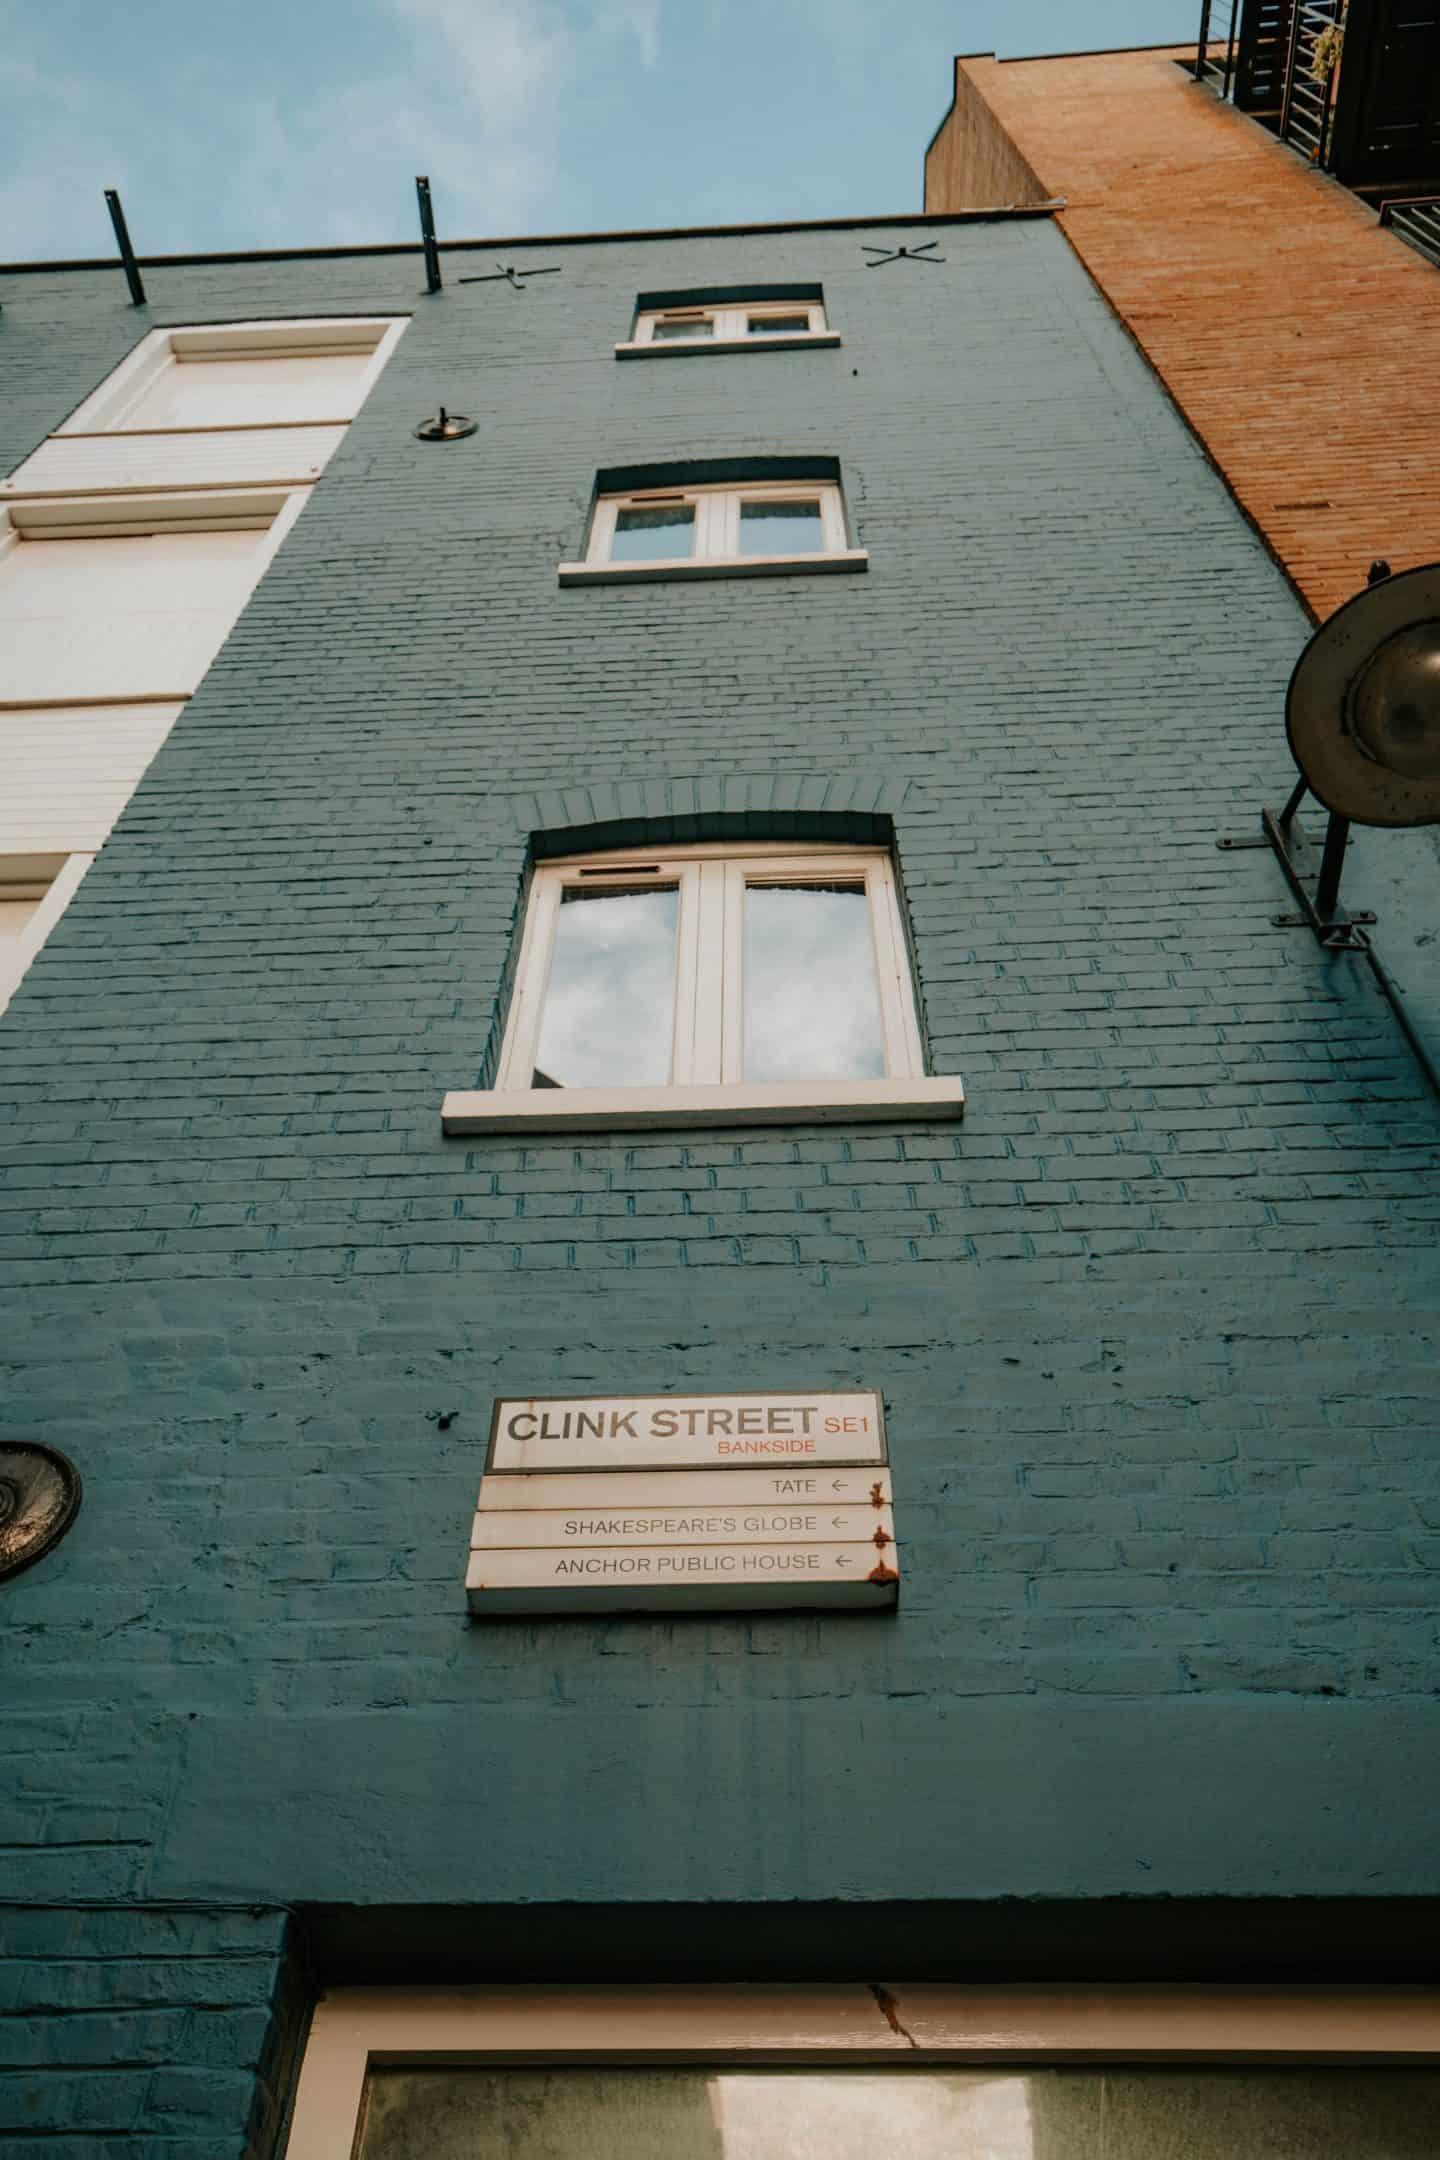 Clink Street Building